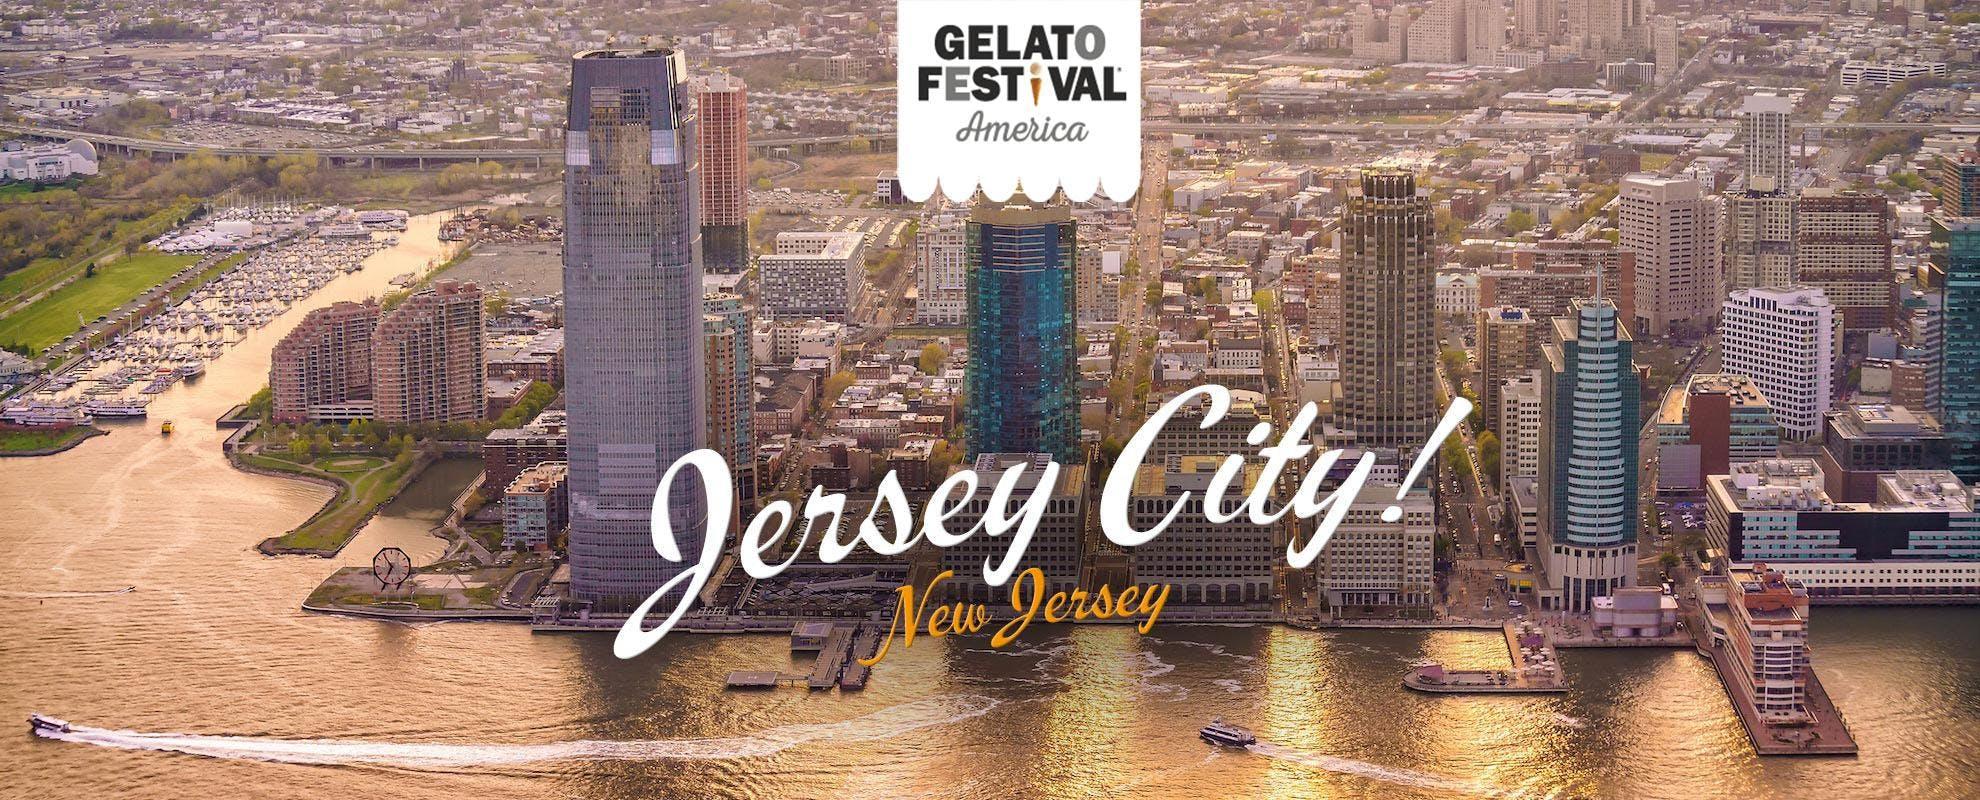 GELATO FESTIVAL JERSEY CITY 2018